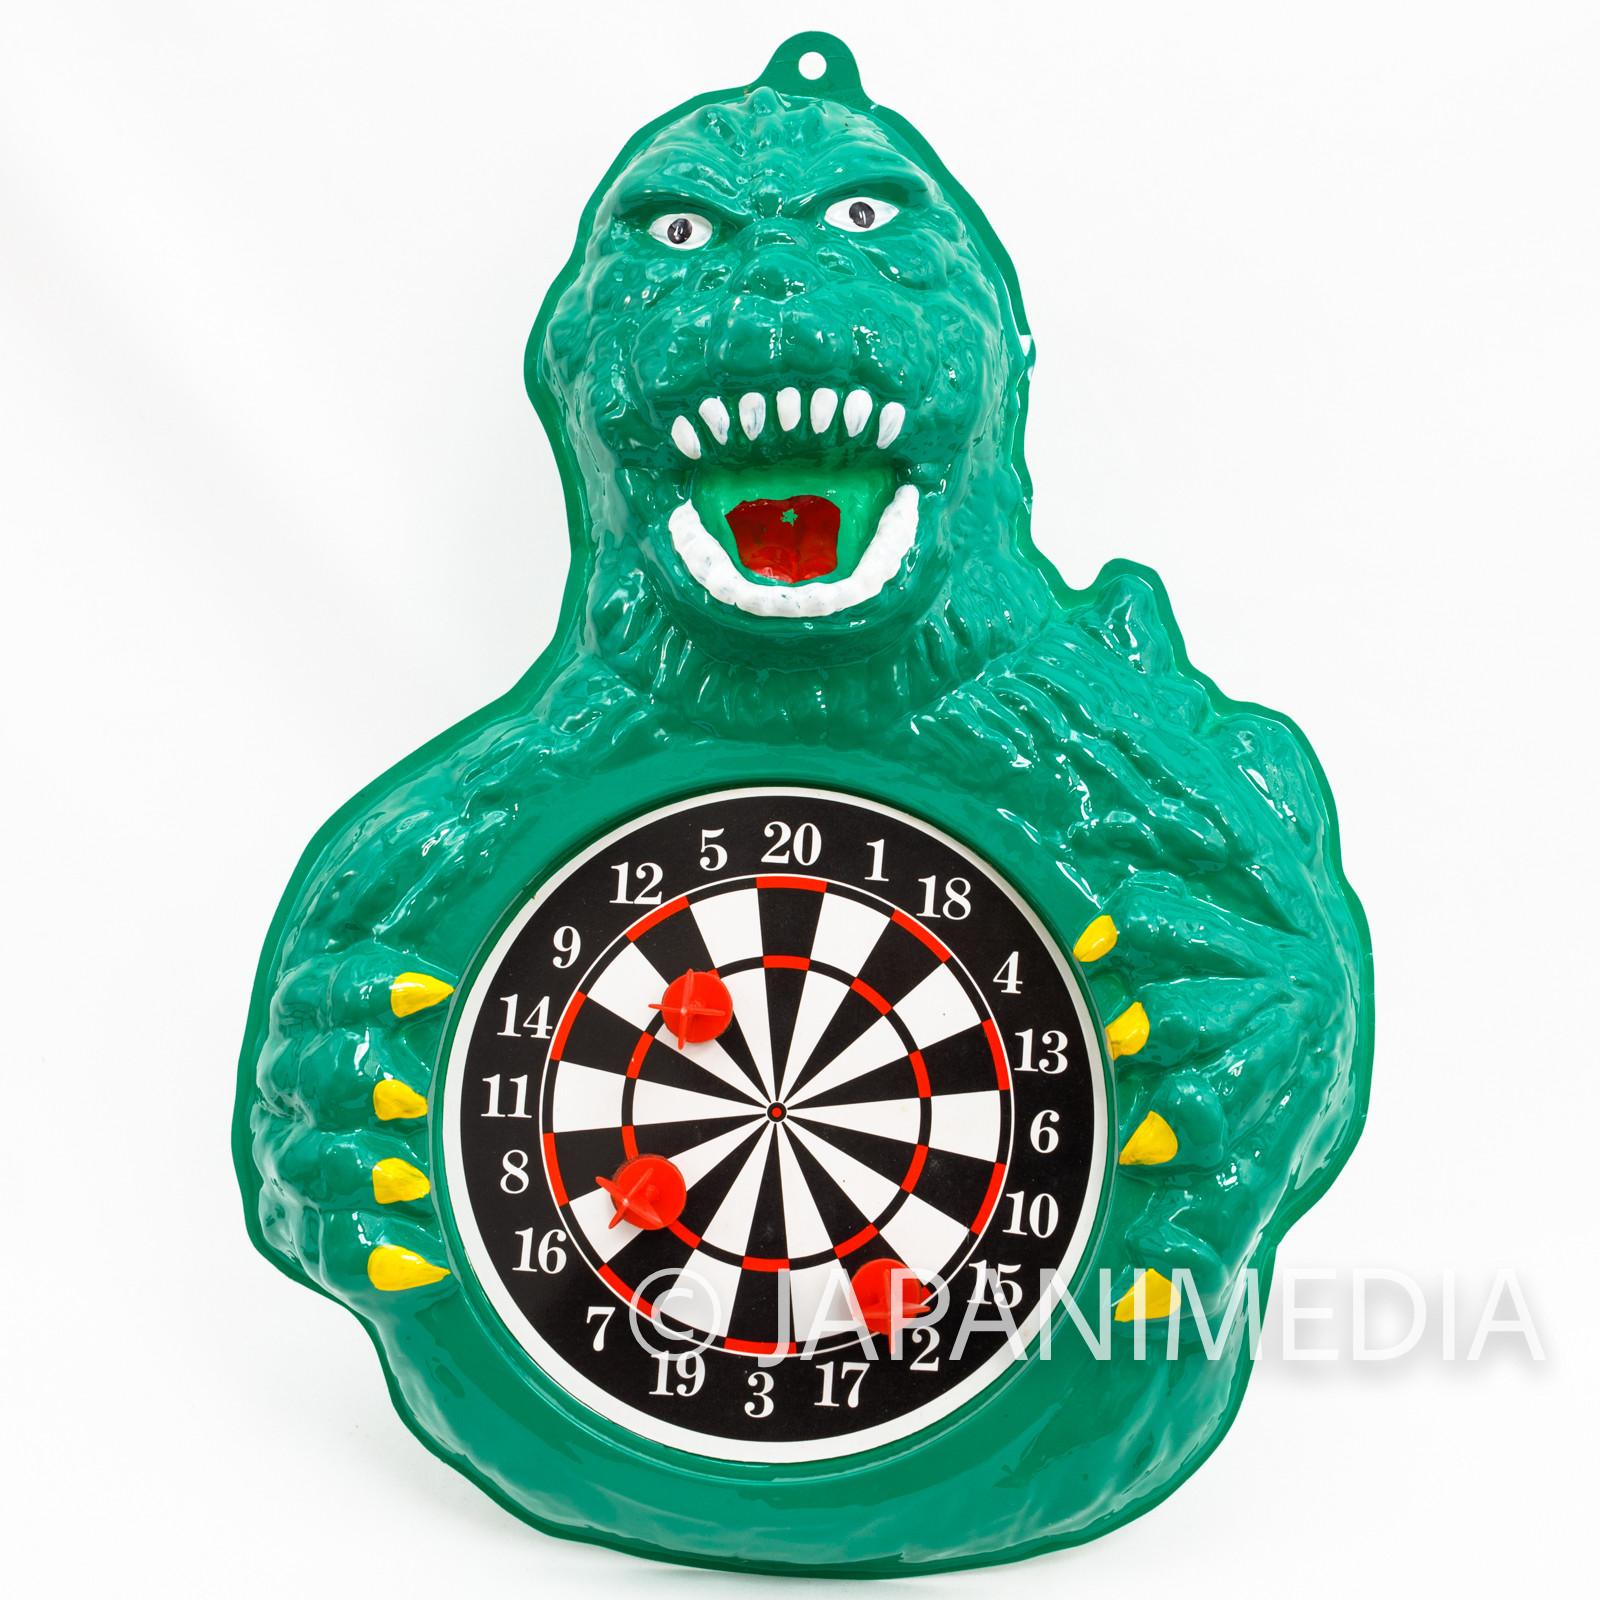 Retro Godzilla Plastic Darts Toy Set JAPAN TOKUSATSU